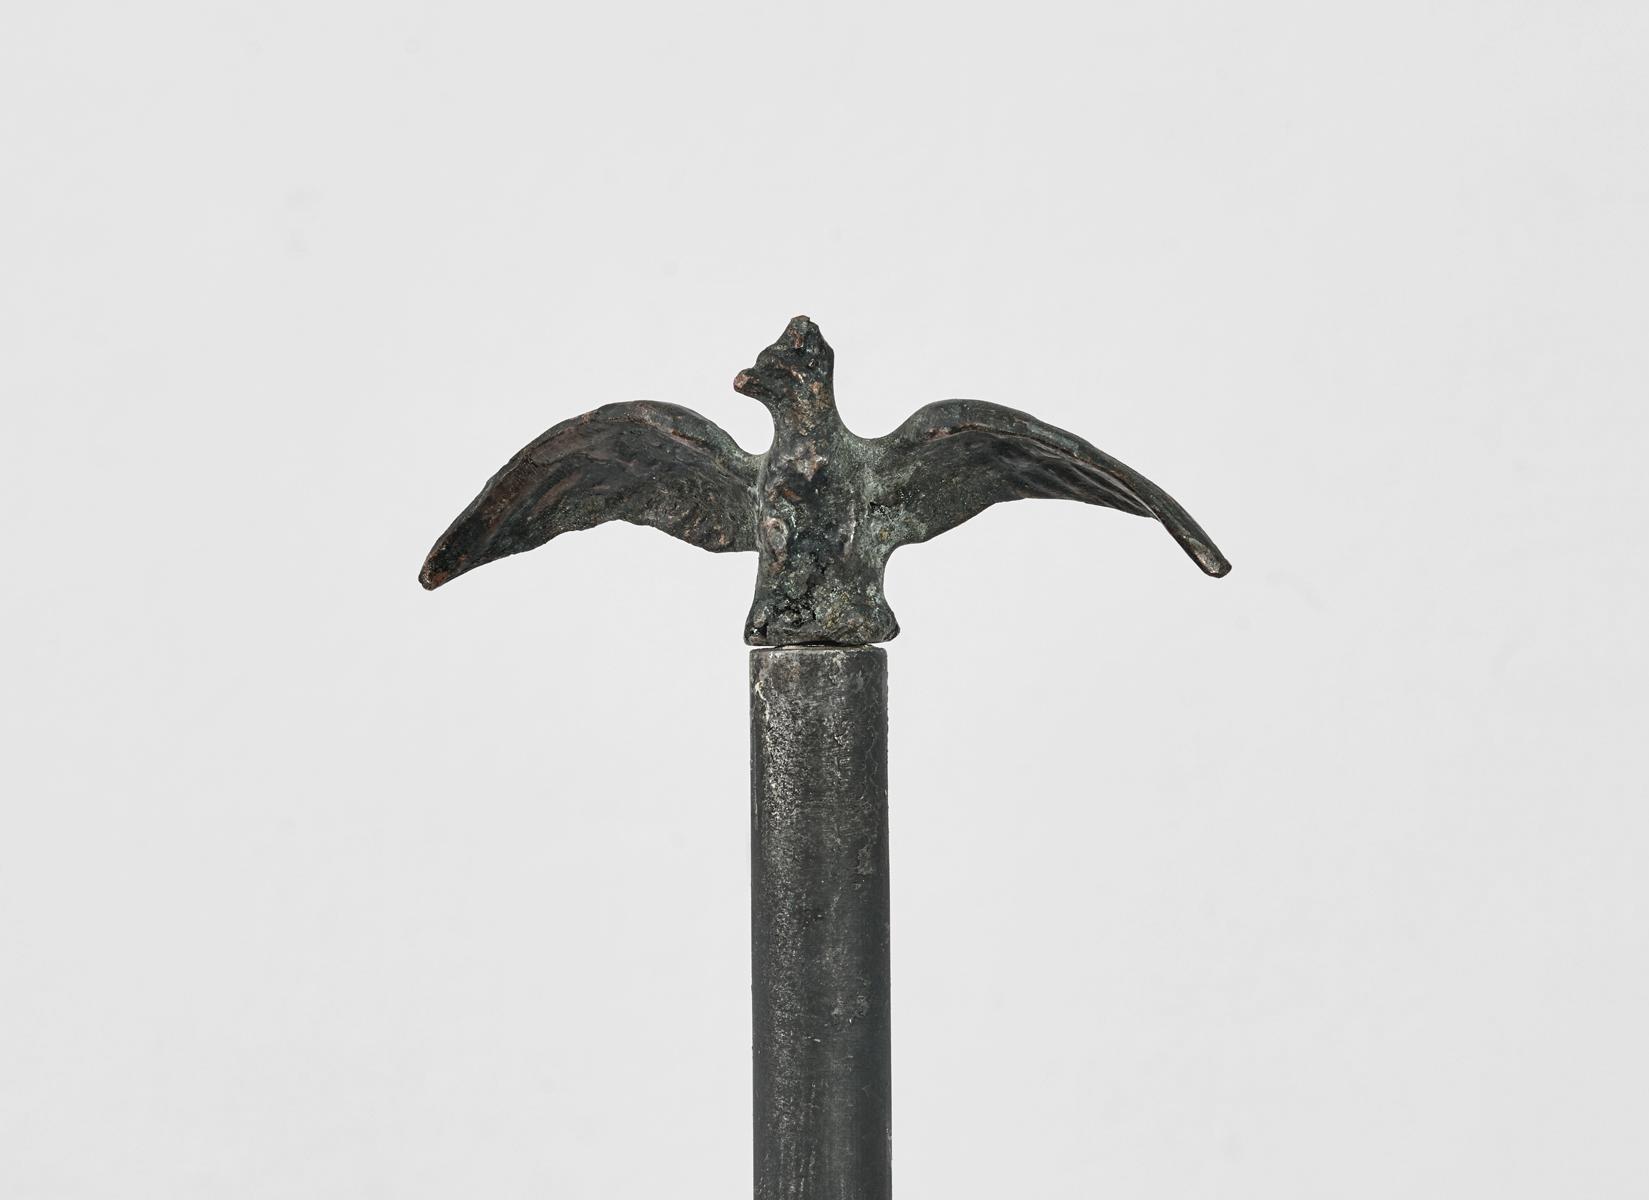 ACTUS PURUS / Eagle (detail) / 2016 / 37 x 195 x 37 cm / eagle figure, stand